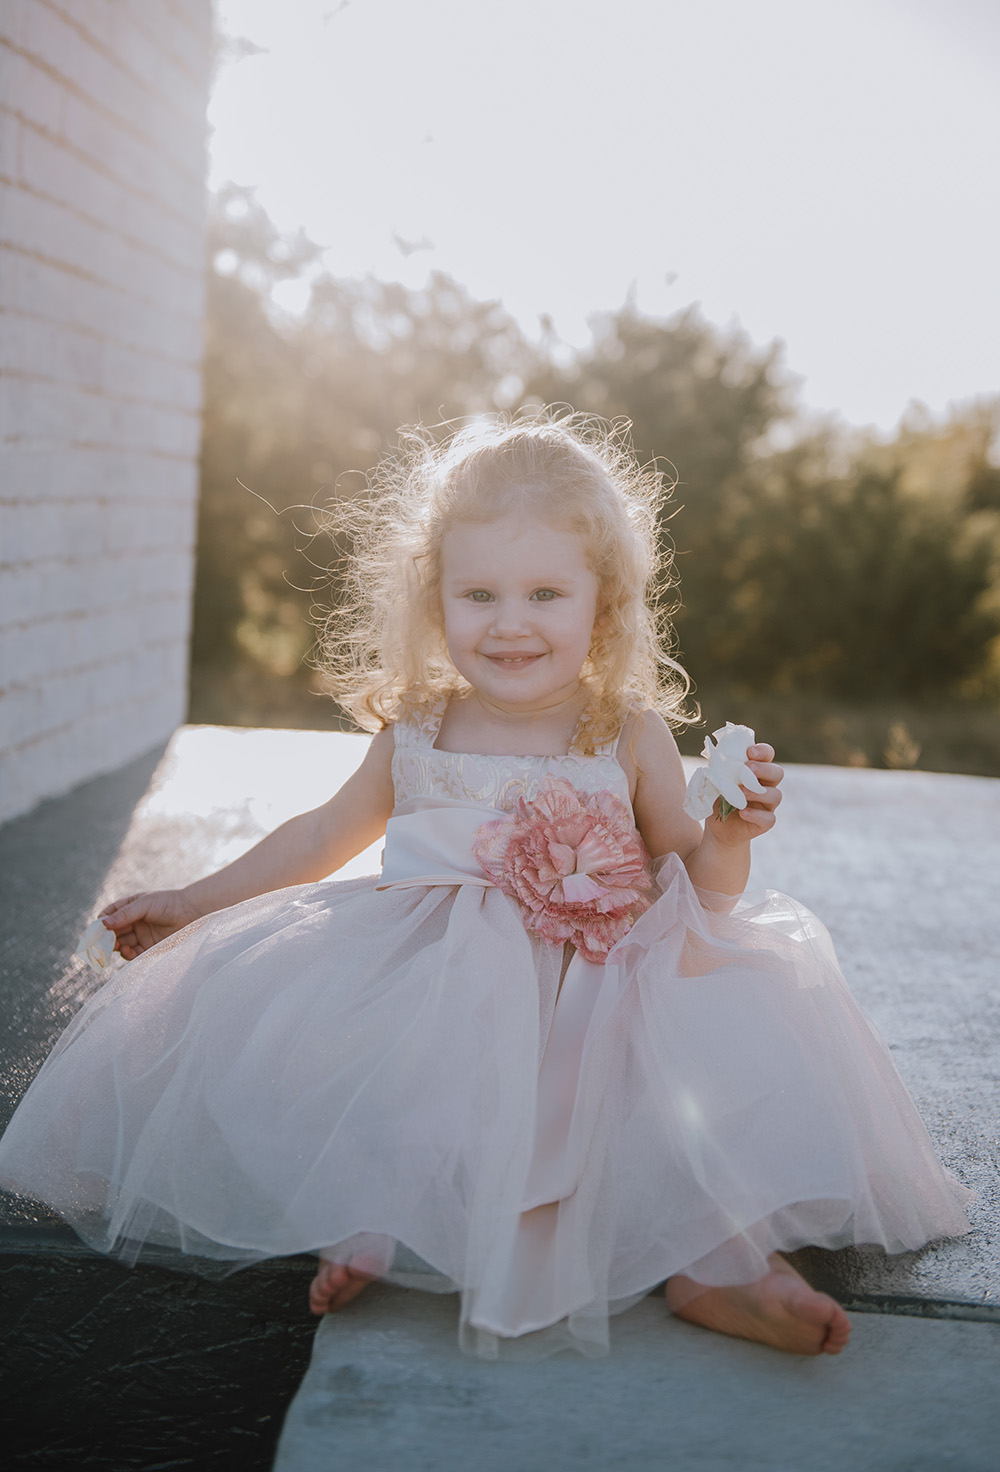 Flower Girl Dresses - The Grand Ivory Wedding - Leonard, Texas Wedding Venue